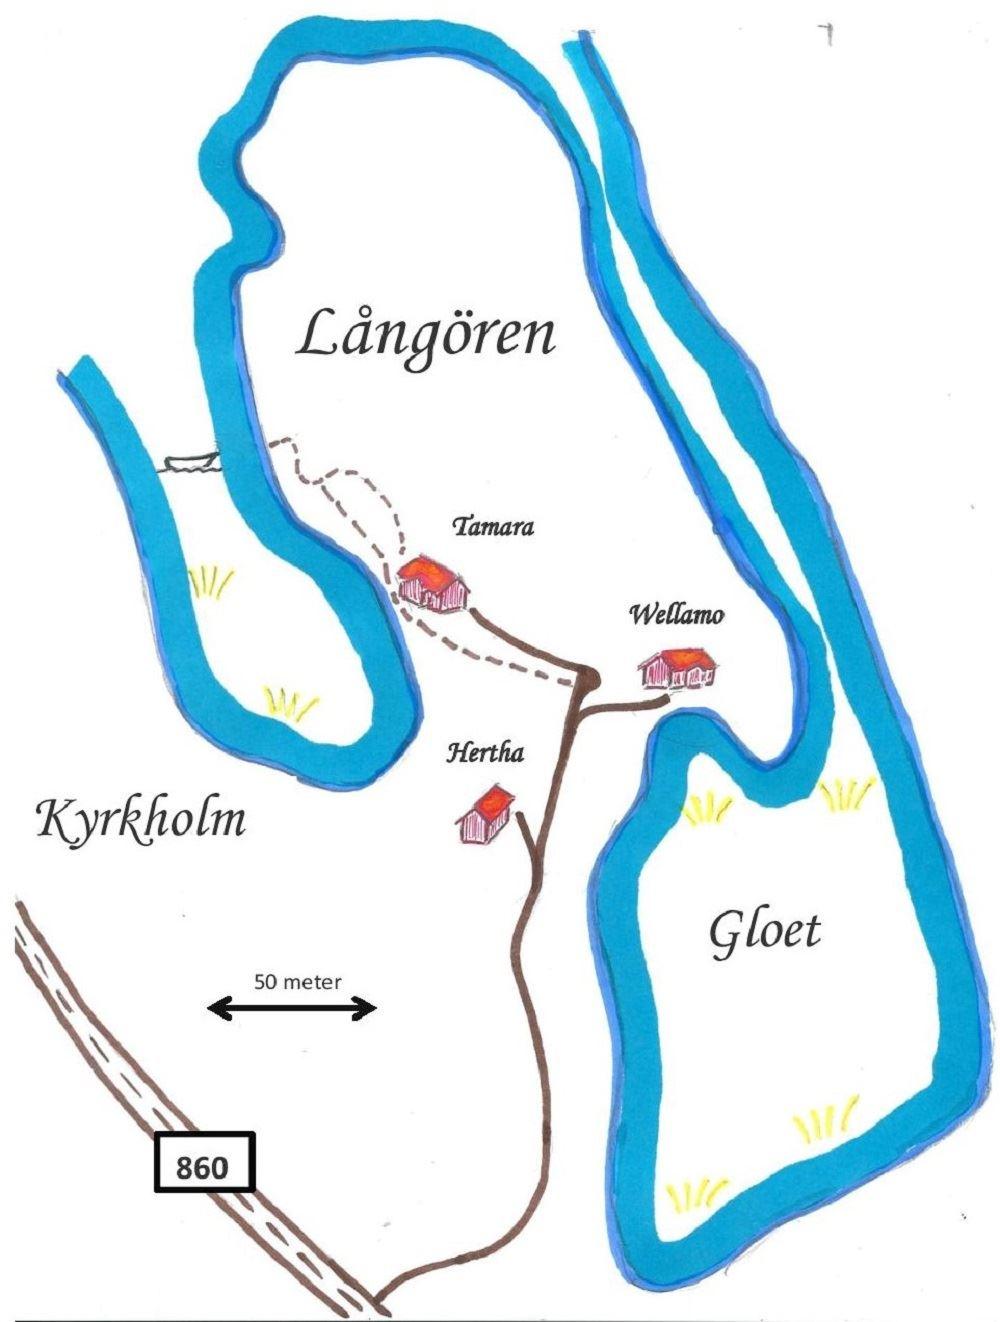 Ab Långören, Brändö